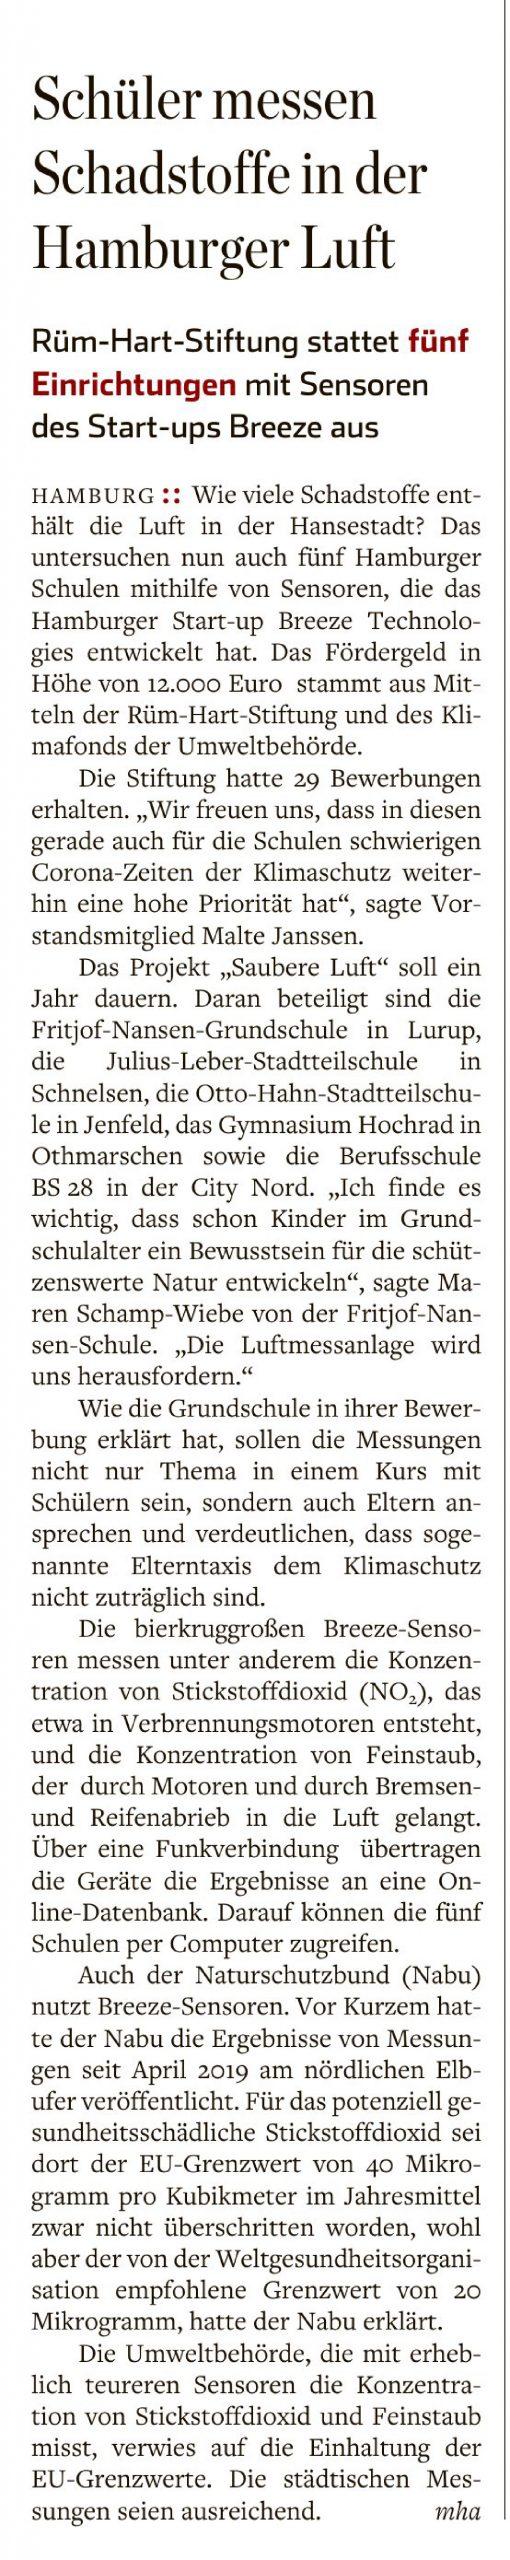 Hamburger Abendblatt 13.07.2020